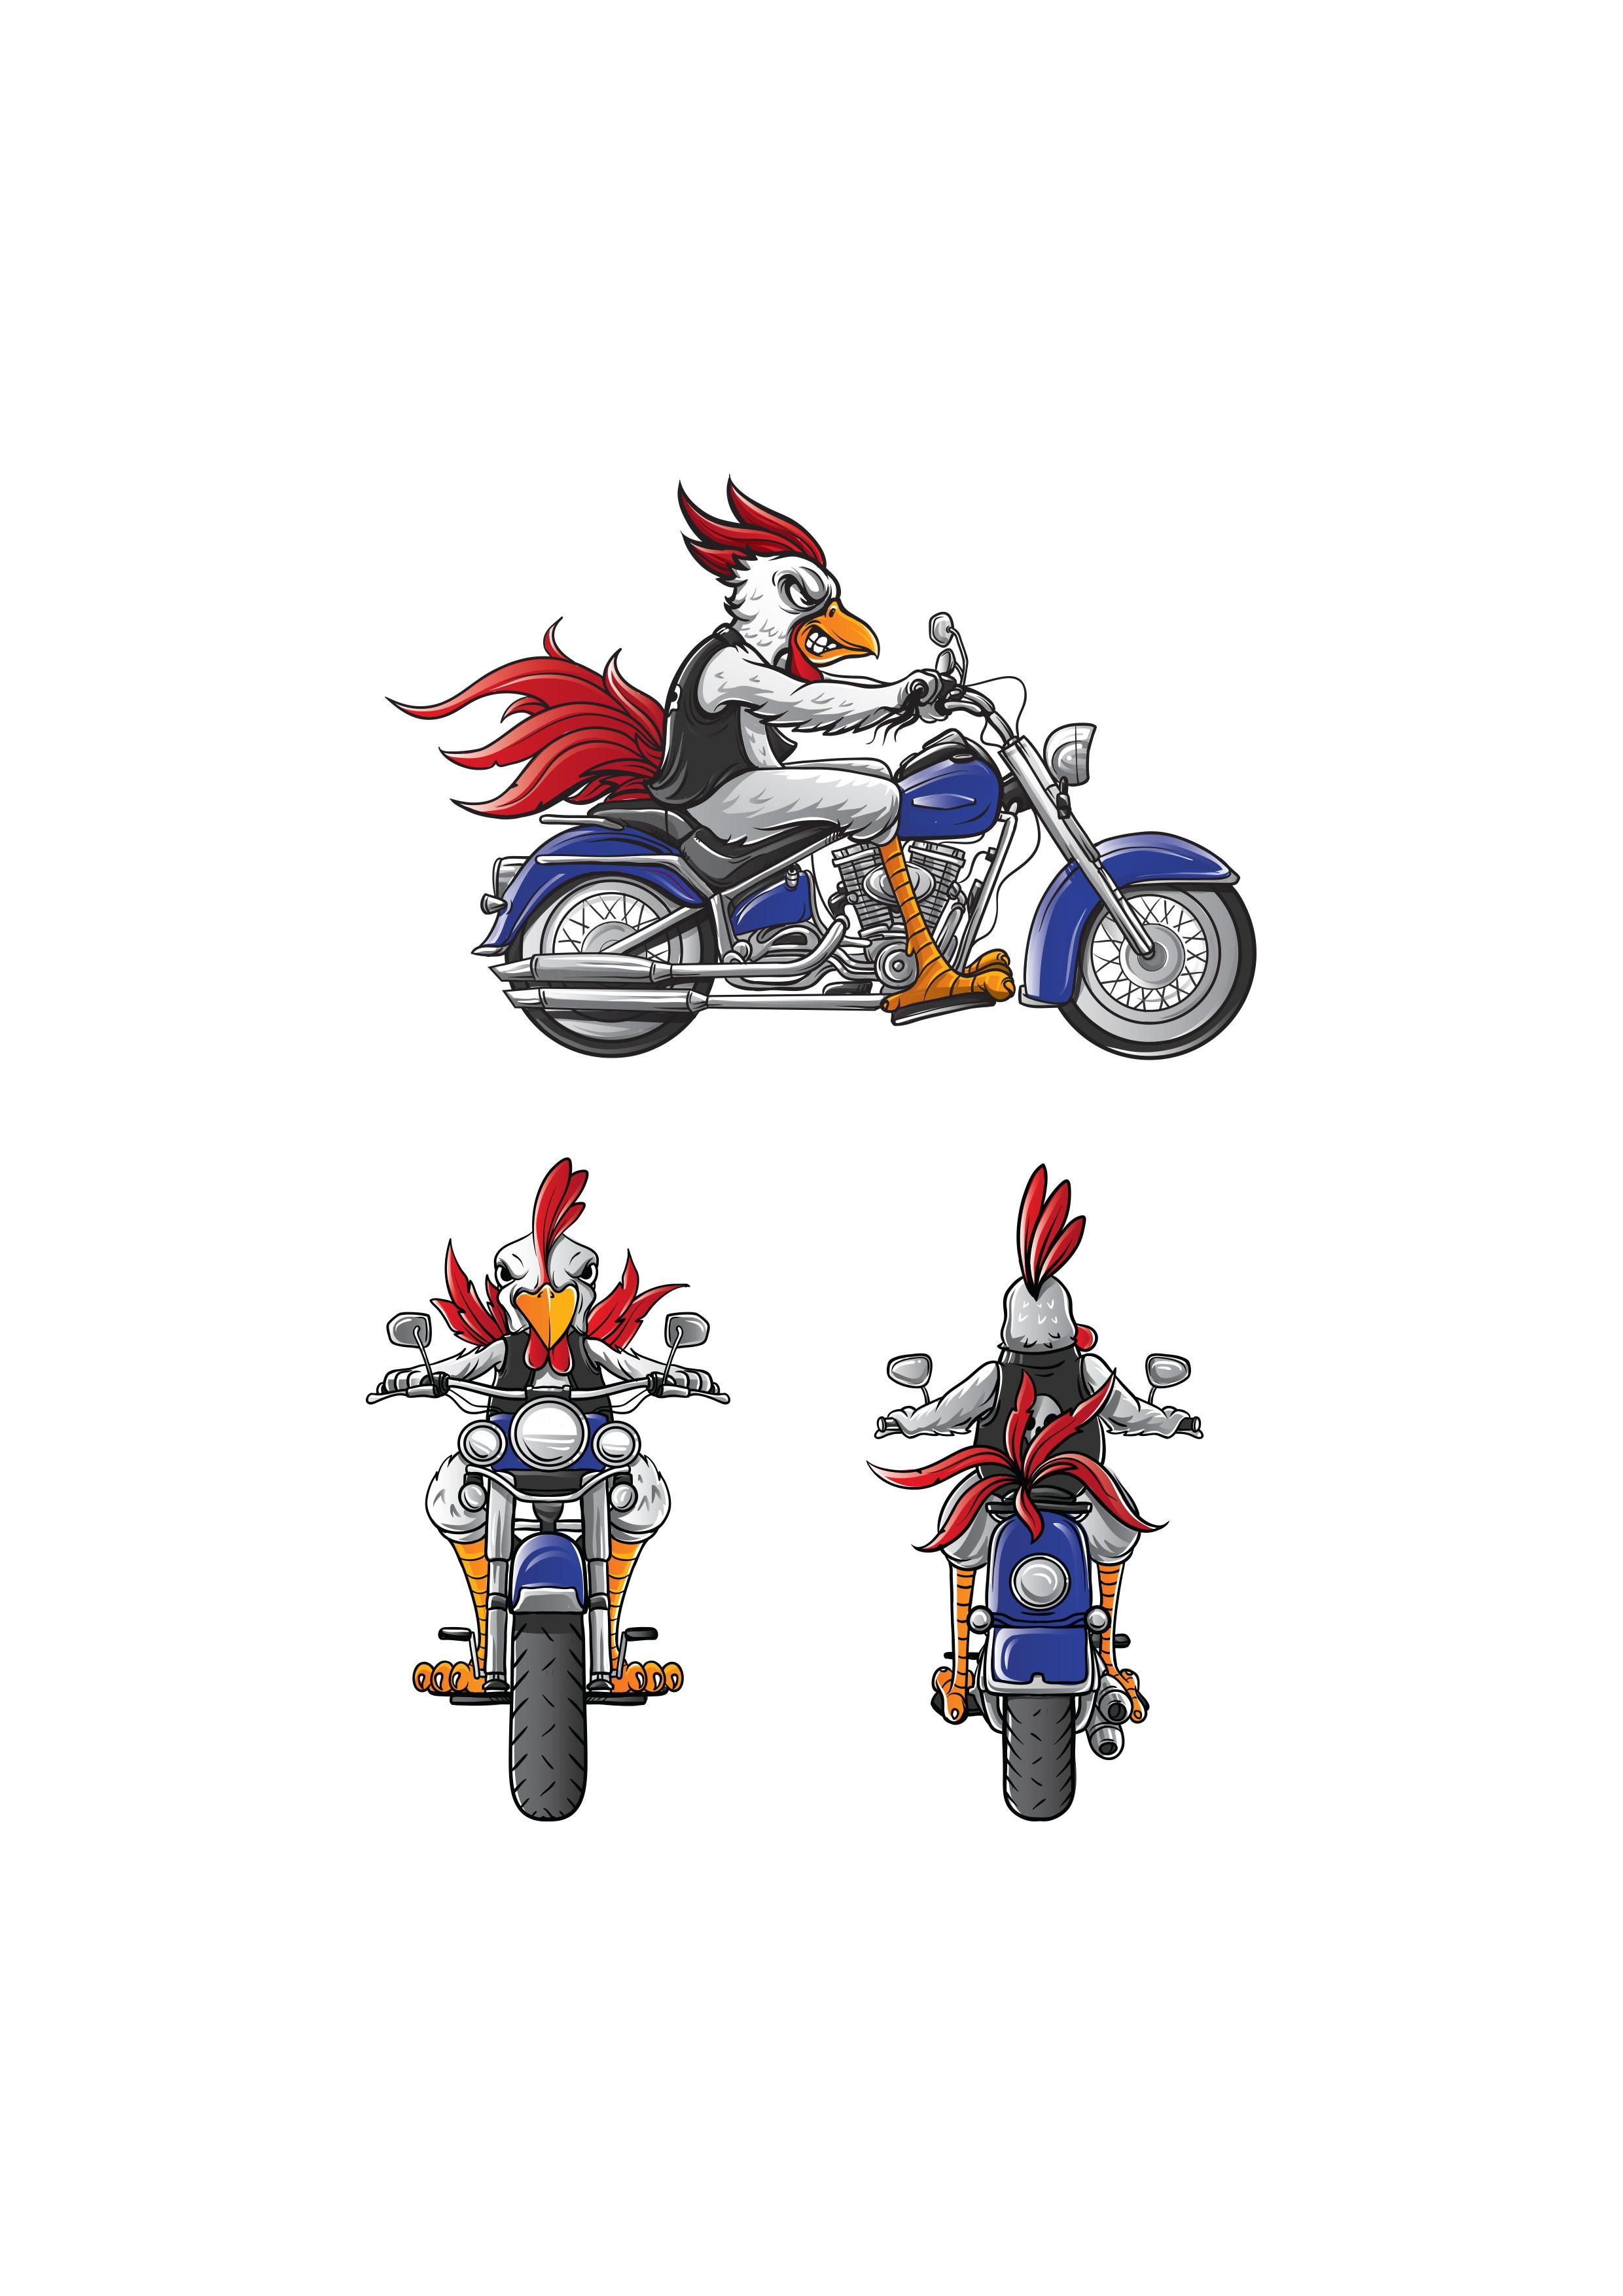 Harley-Davidson logo mascot